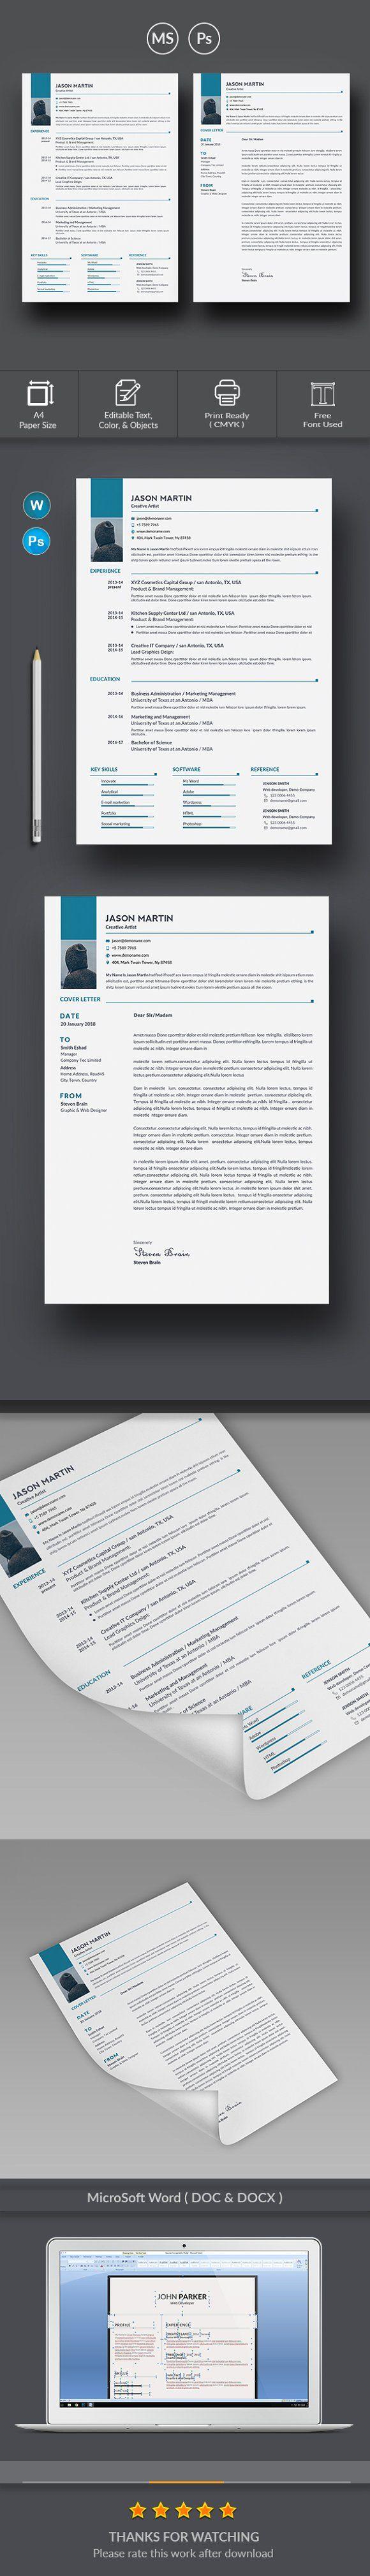 328 best documents design ideas images on pinterest resume design